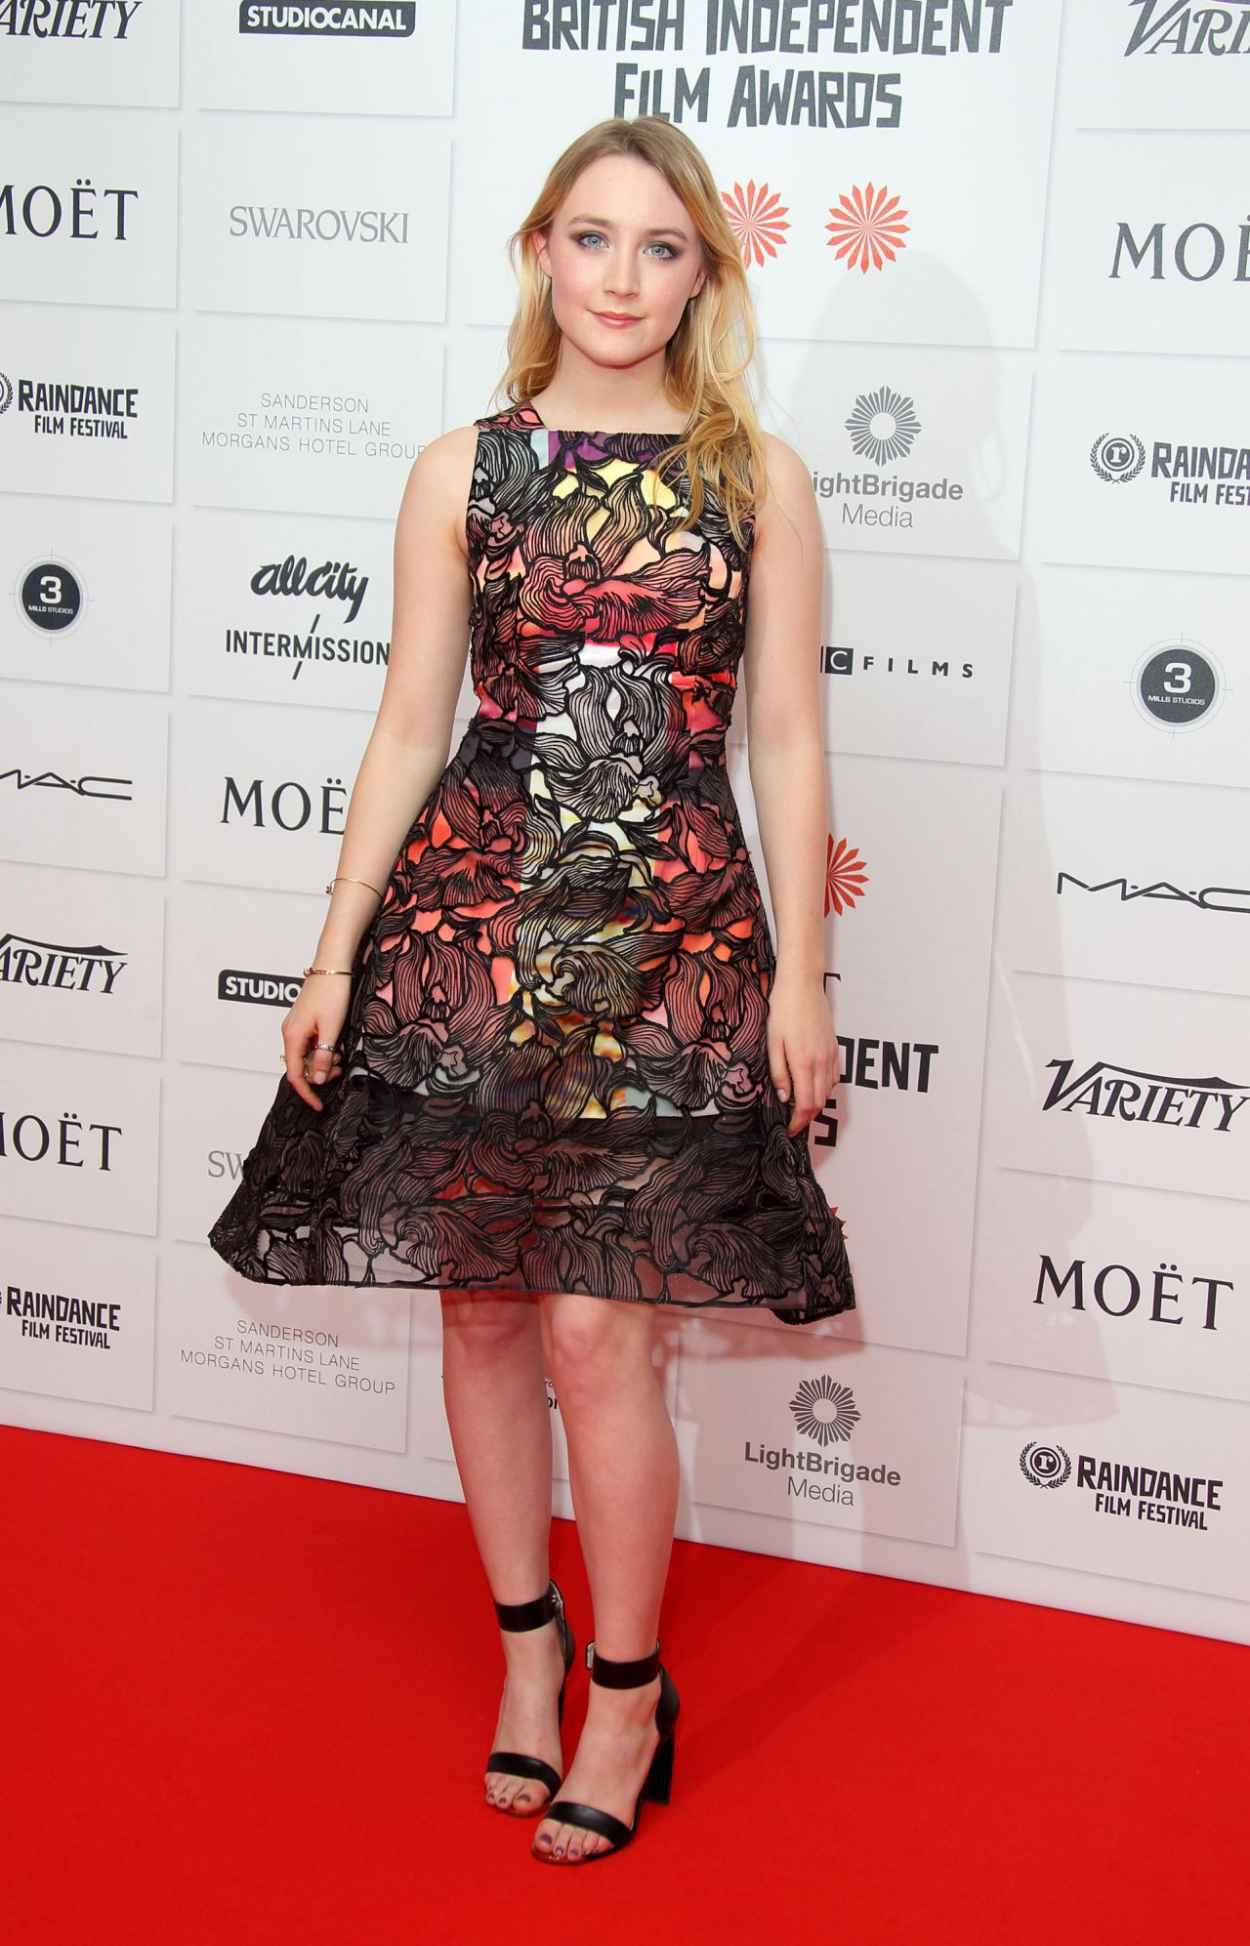 Saoirse Ronan on Red Carpet - 2015 Moet British Independent Film Awards in London-1